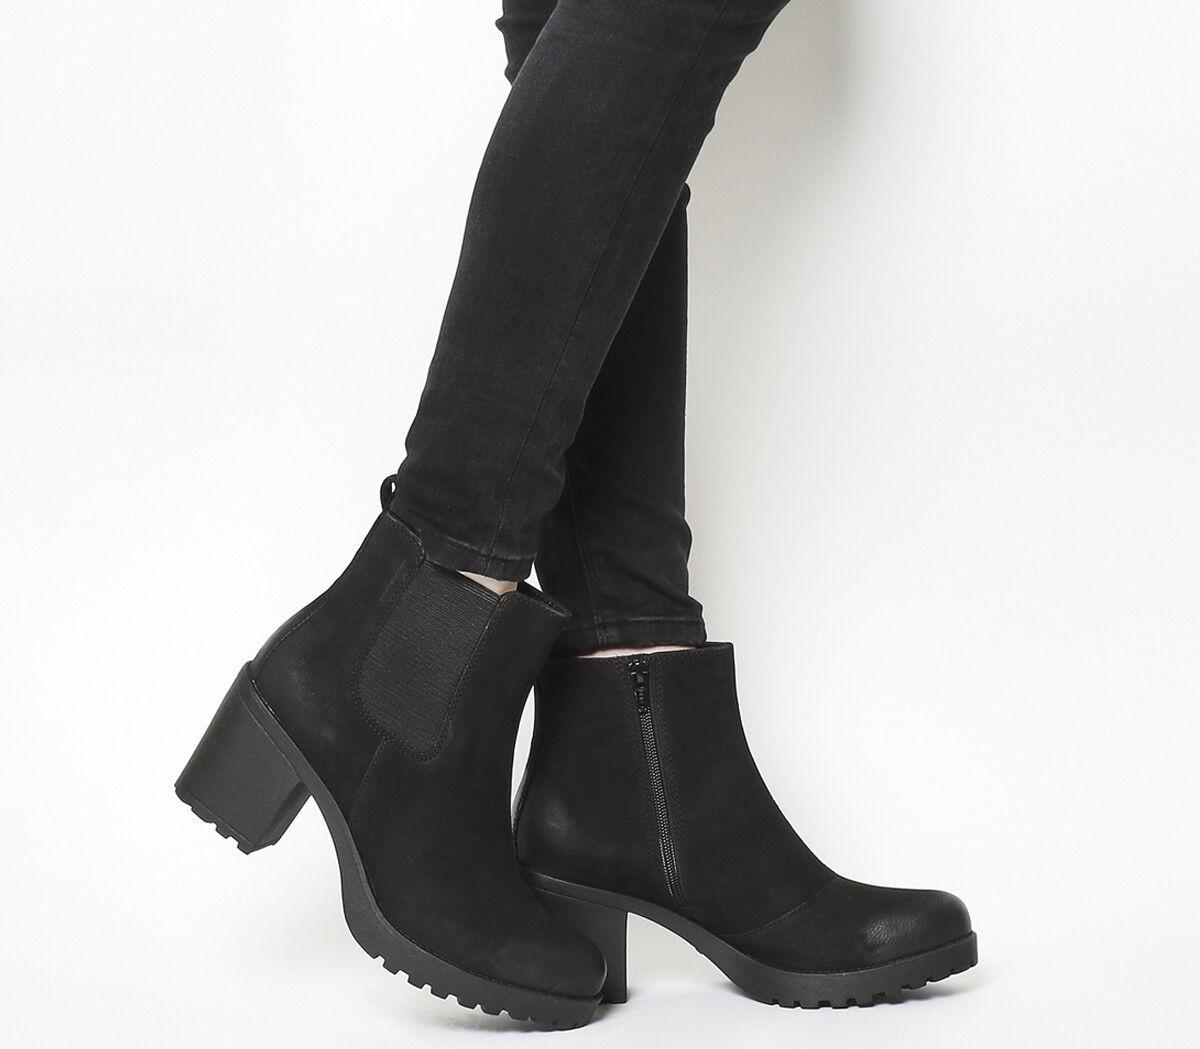 botas para mujer Vagabond Gracia Tacón Alto Negro Chelsea botas Negro Alto Nubuck aa09f6